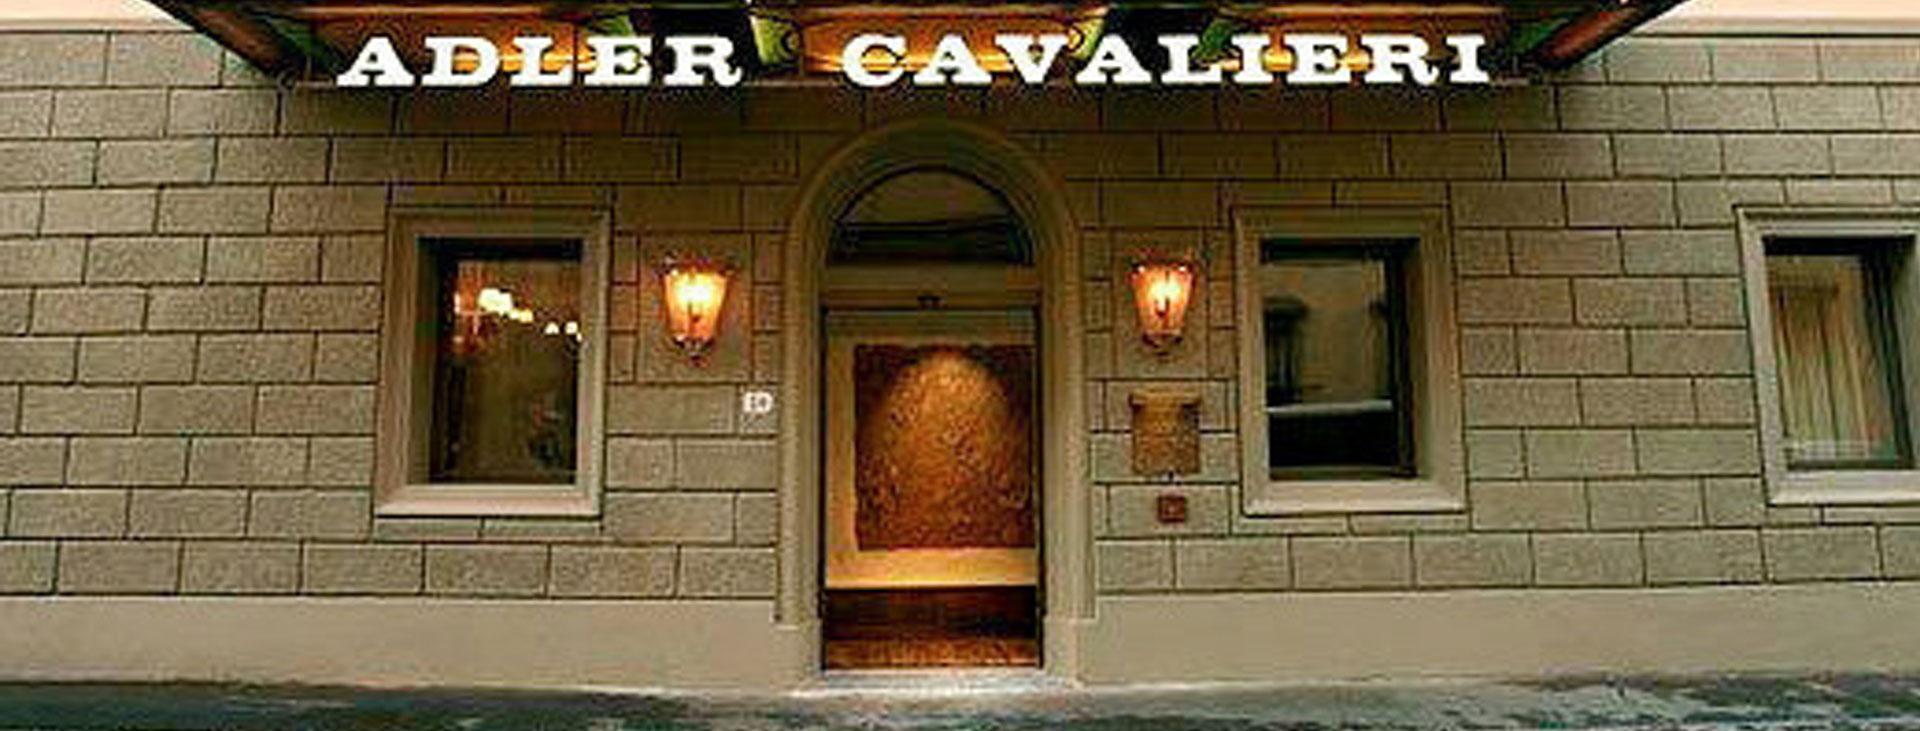 Adler Cavalieri, Florens, Toscana, Italien